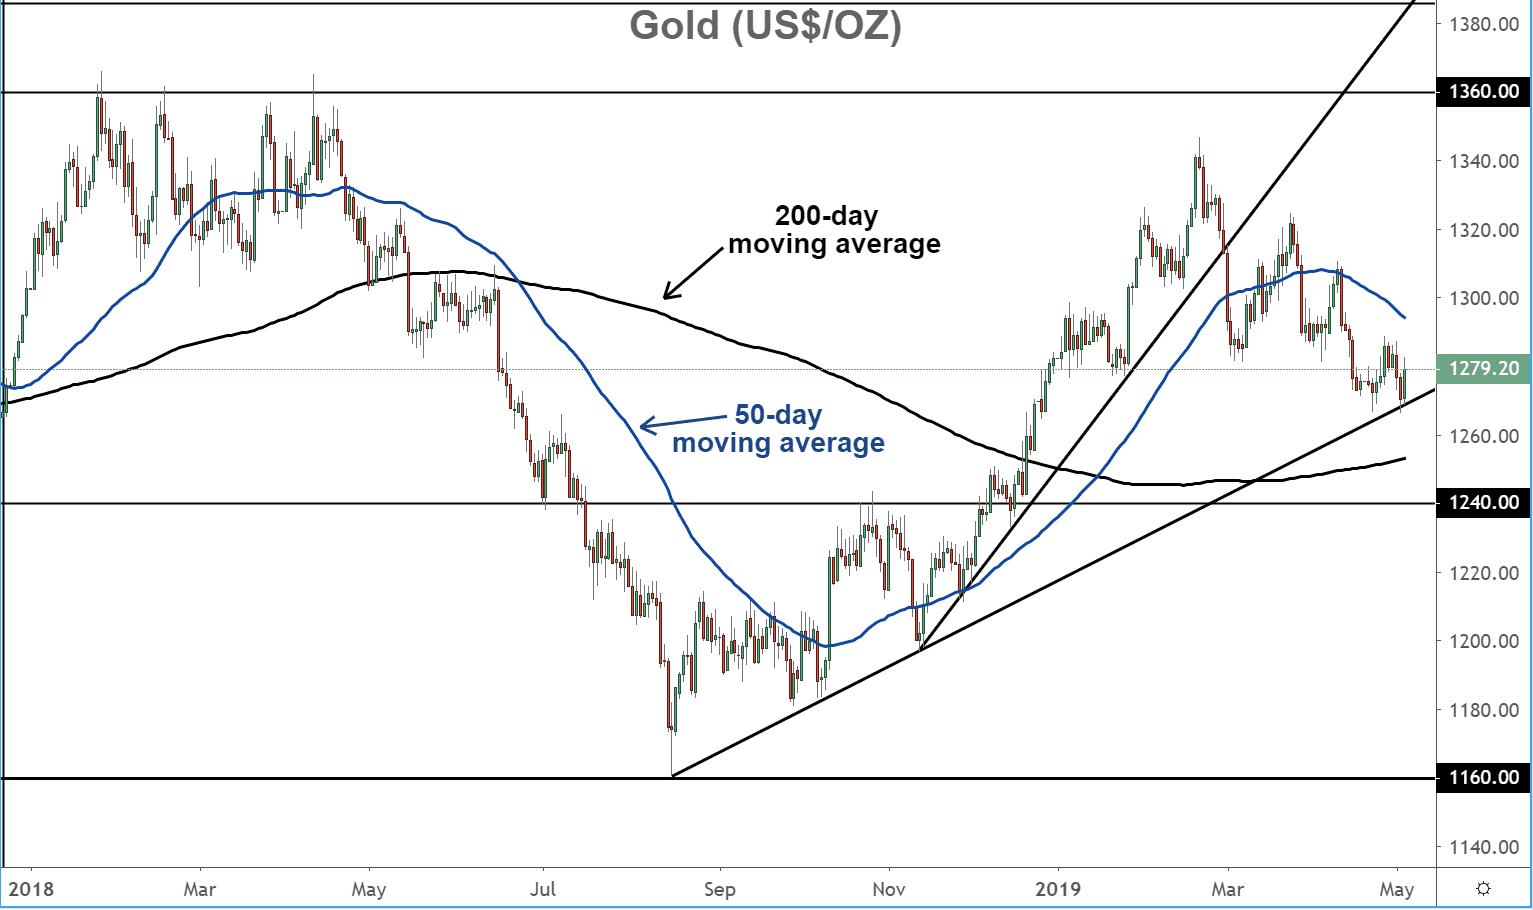 Gold (US $ / oz)